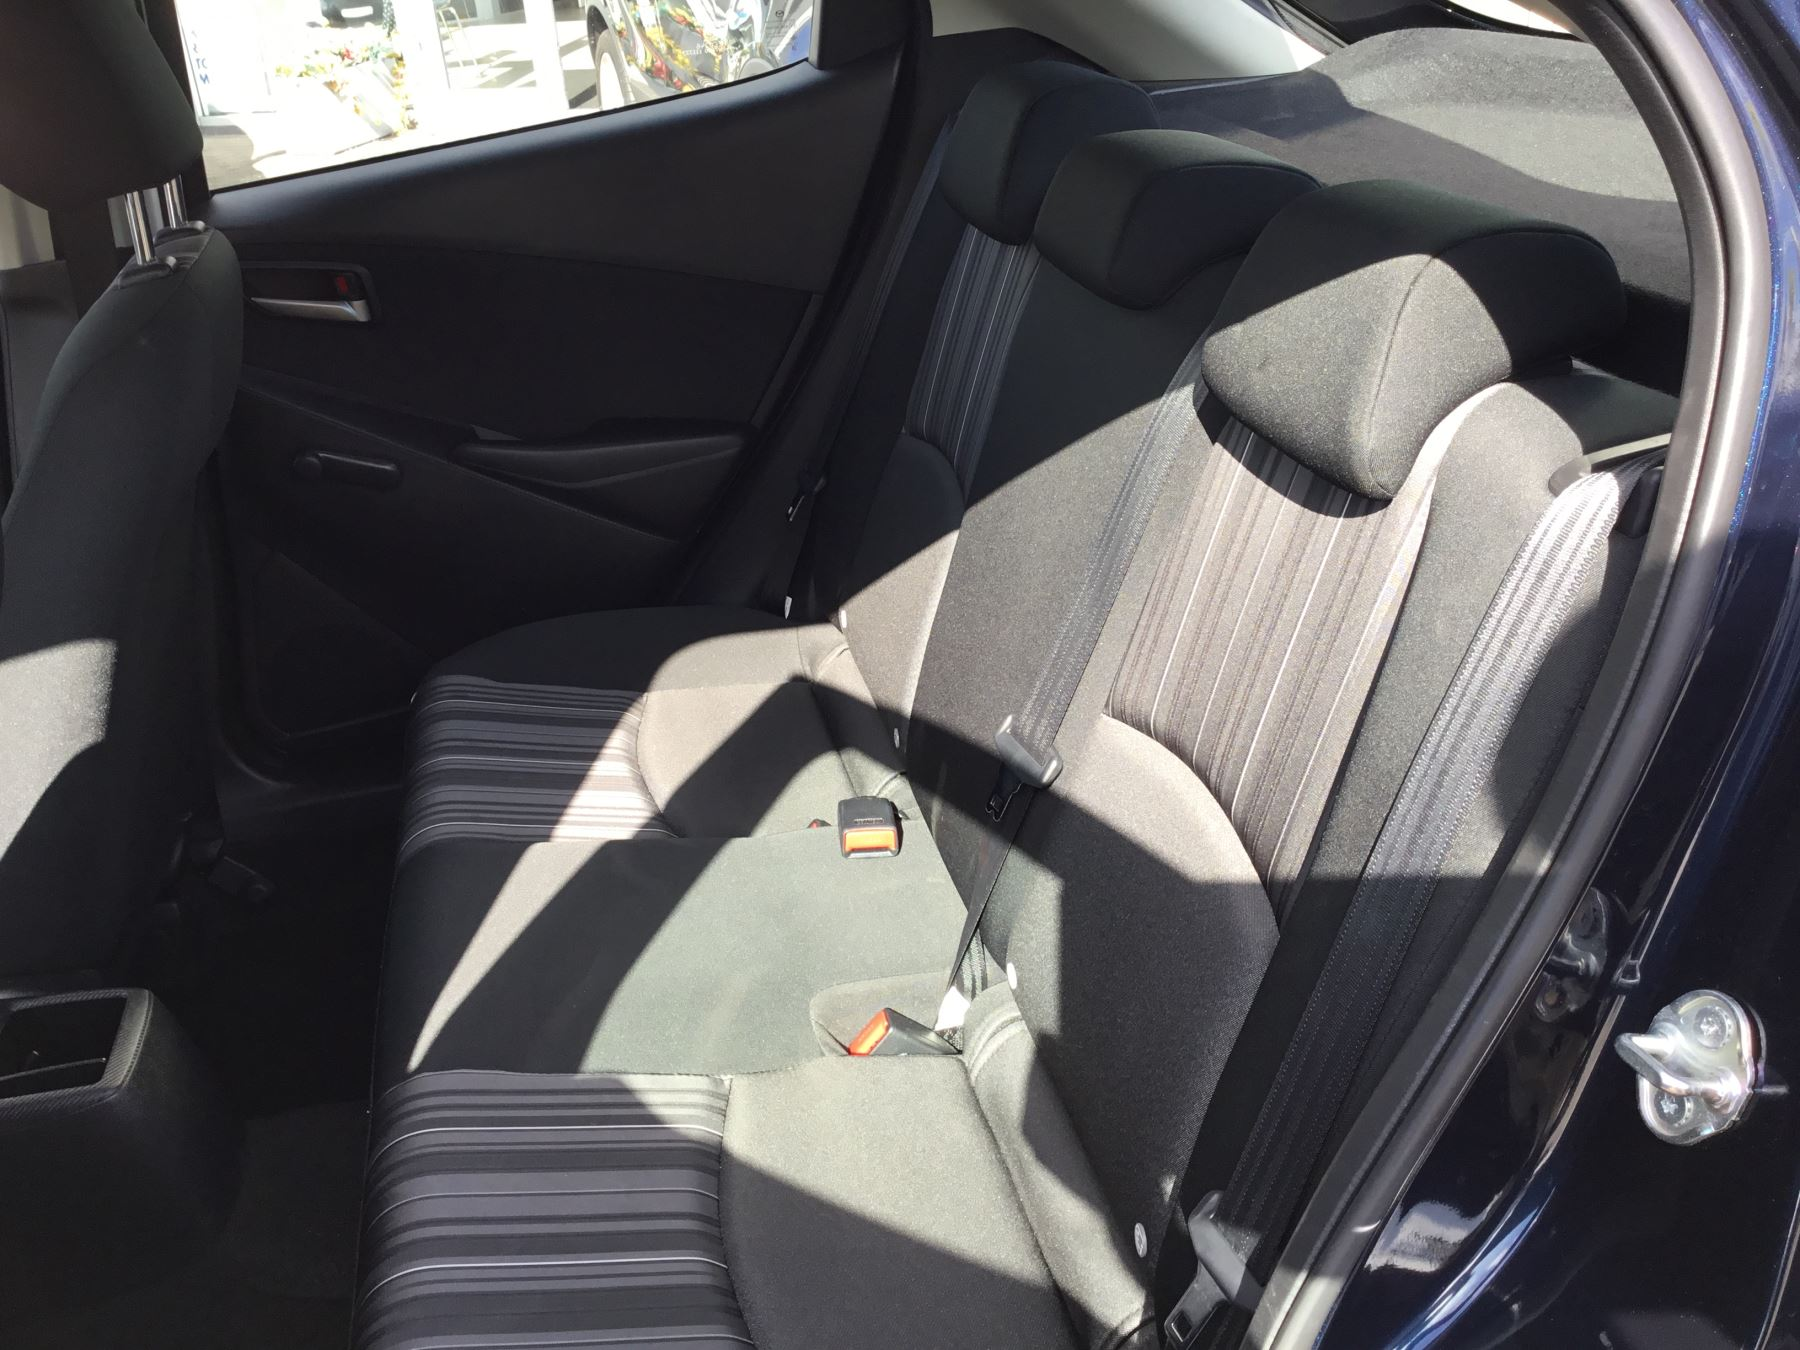 Mazda 2 1.5 75 SE 5dr image 6